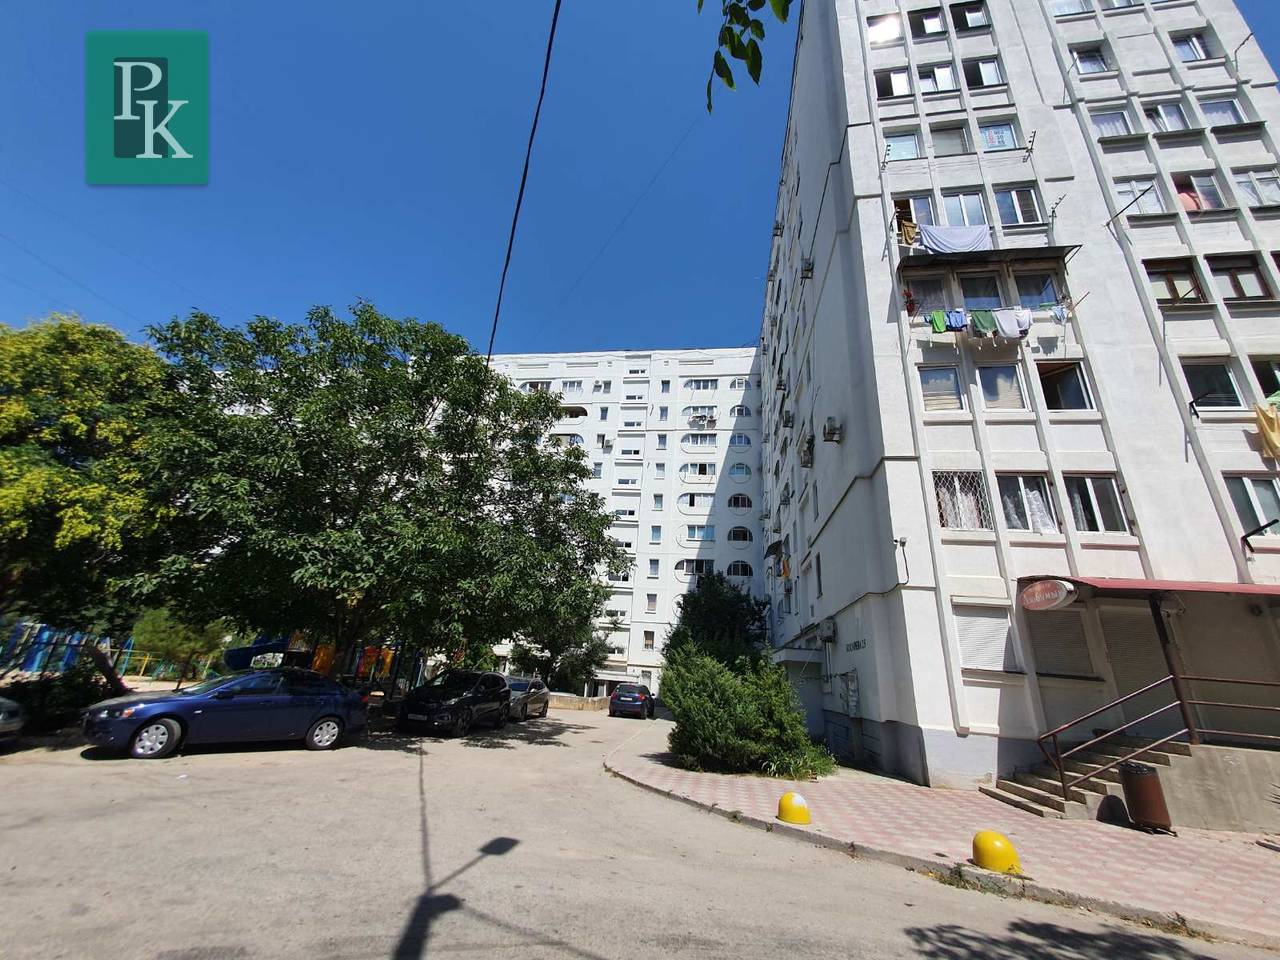 Продается четырехкомнатная квартира на Косарева,25.